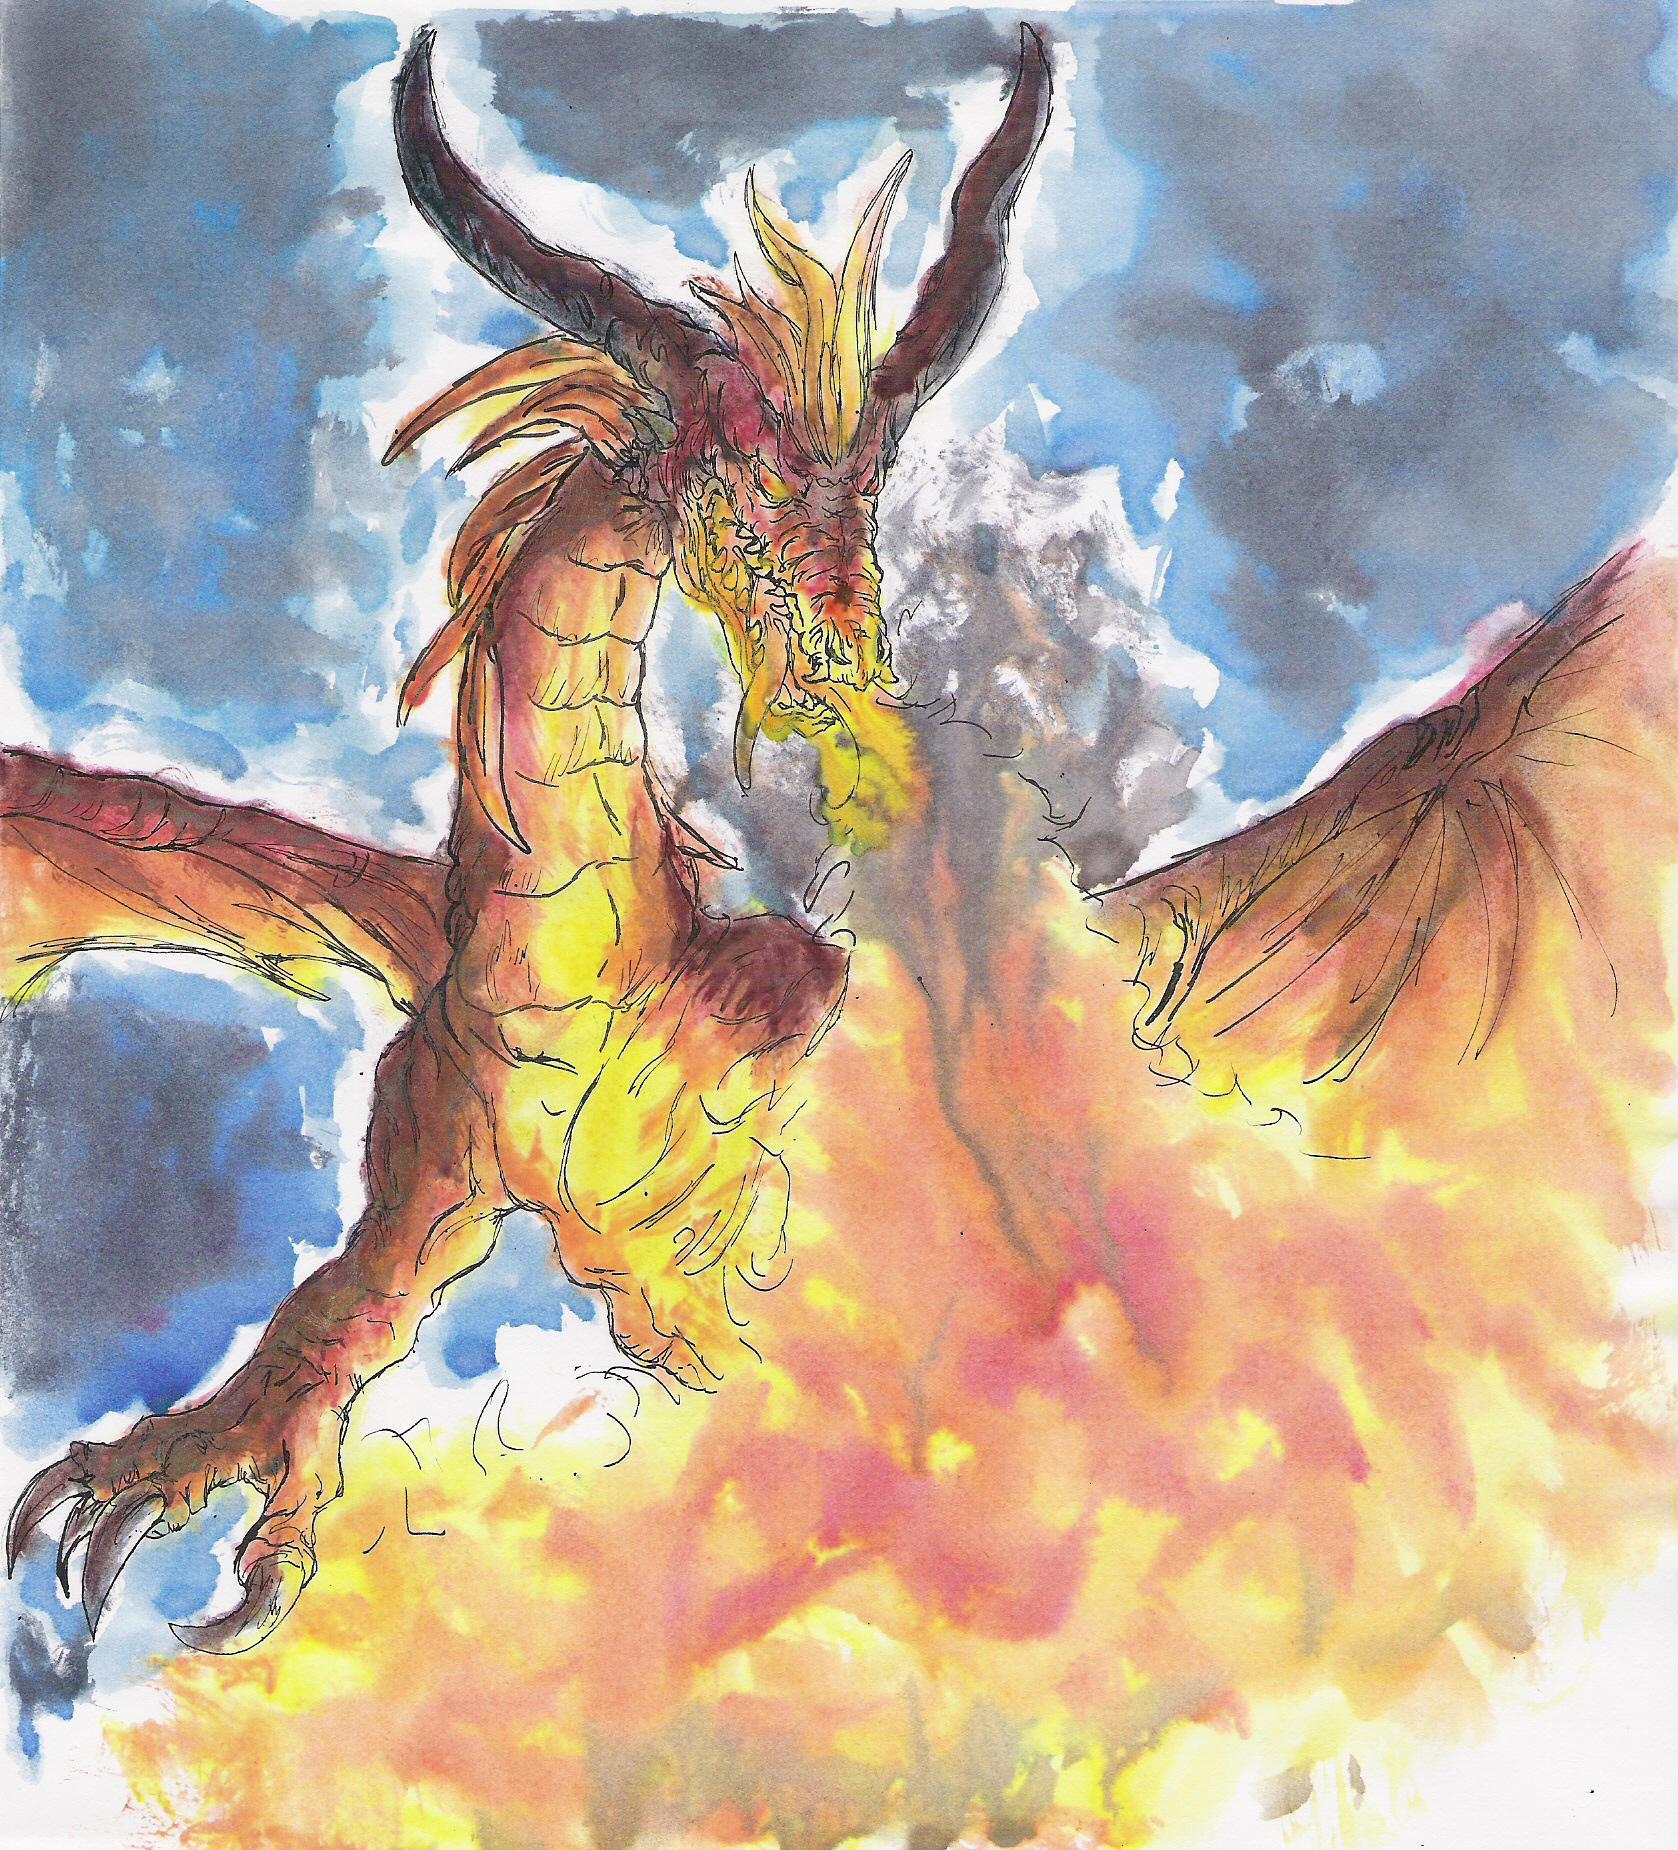 Angry dragon by noire arc en ciel on deviantart - Dragon arc en ciel ...